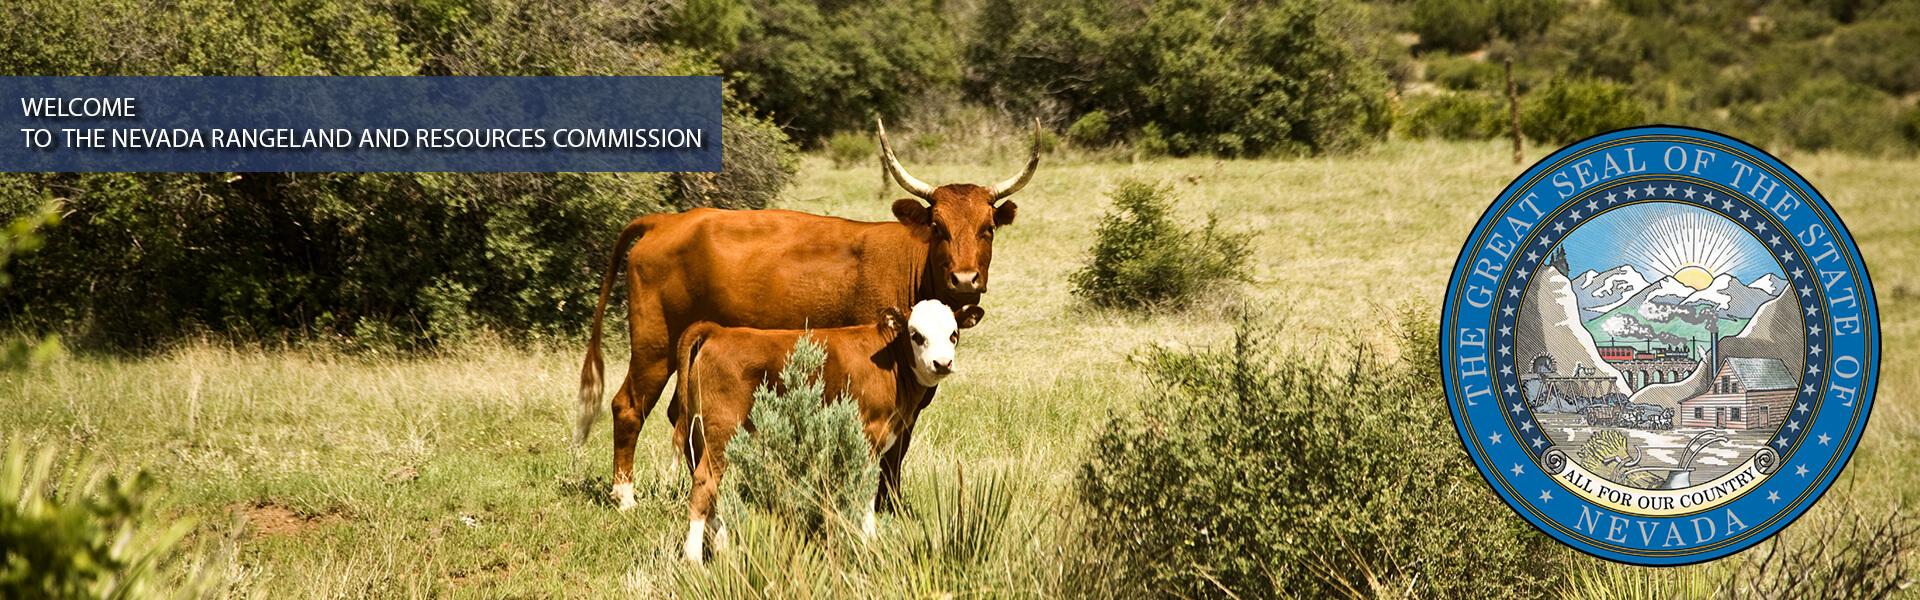 Nevada Rangeland home image 1 blue